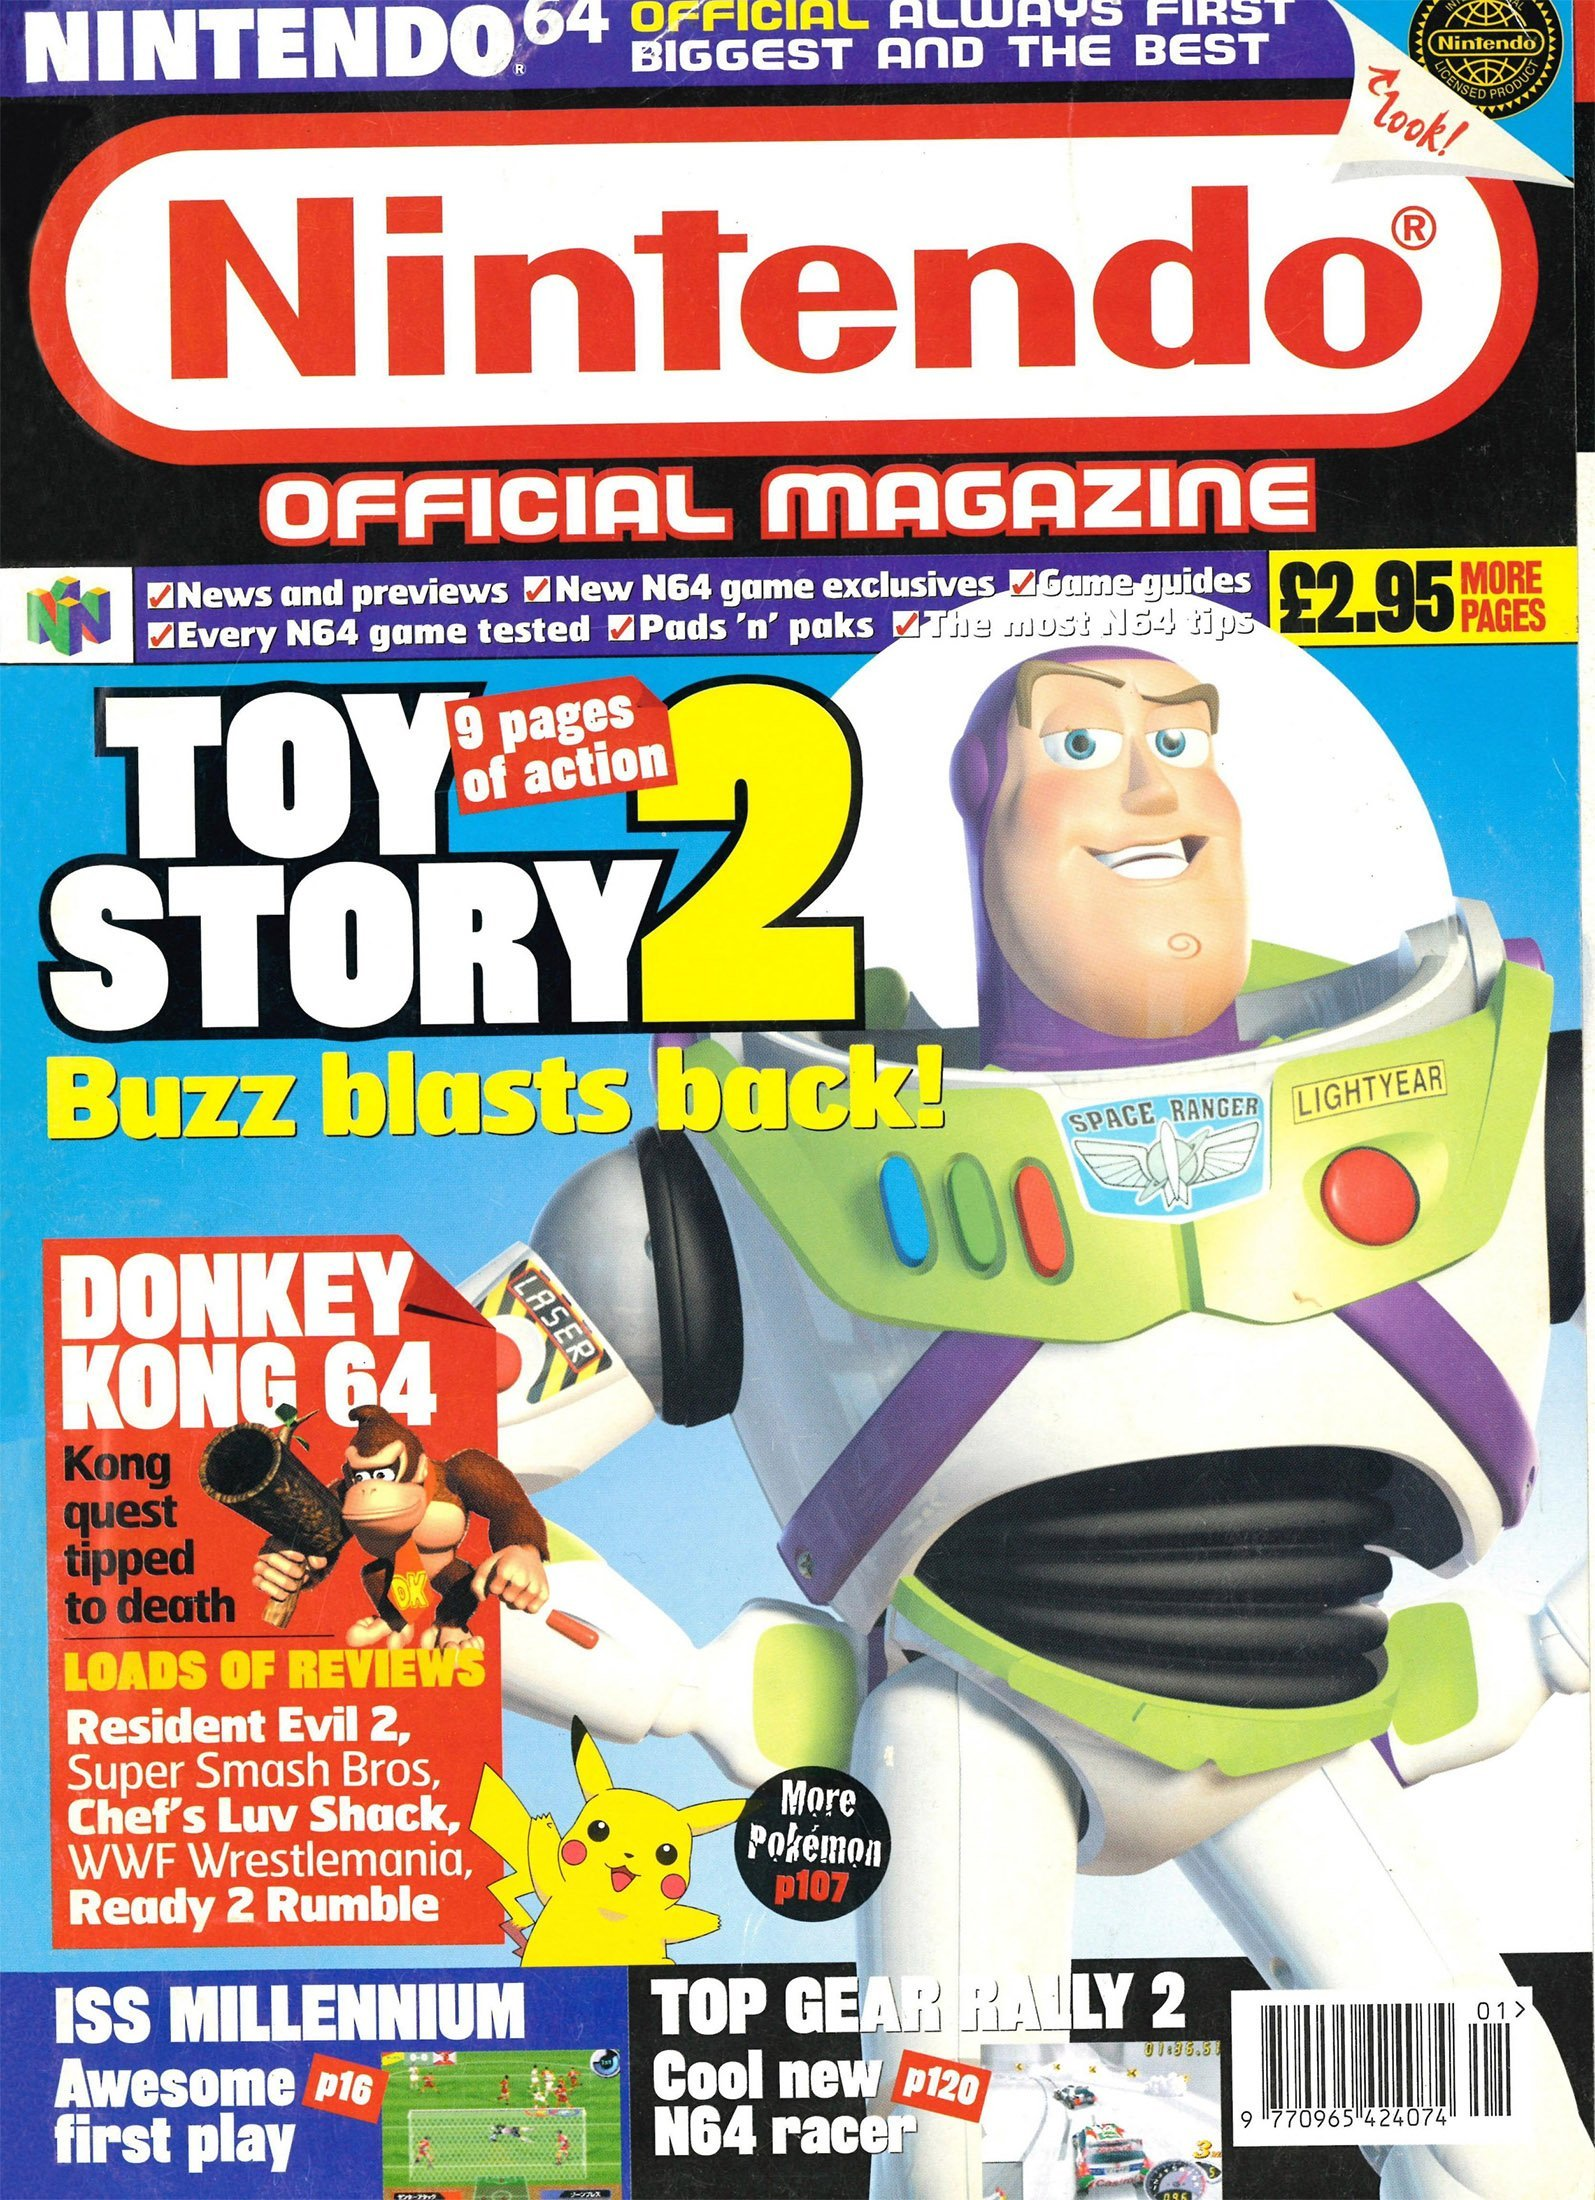 Nintendo Official Magazine 088 (January 2000)